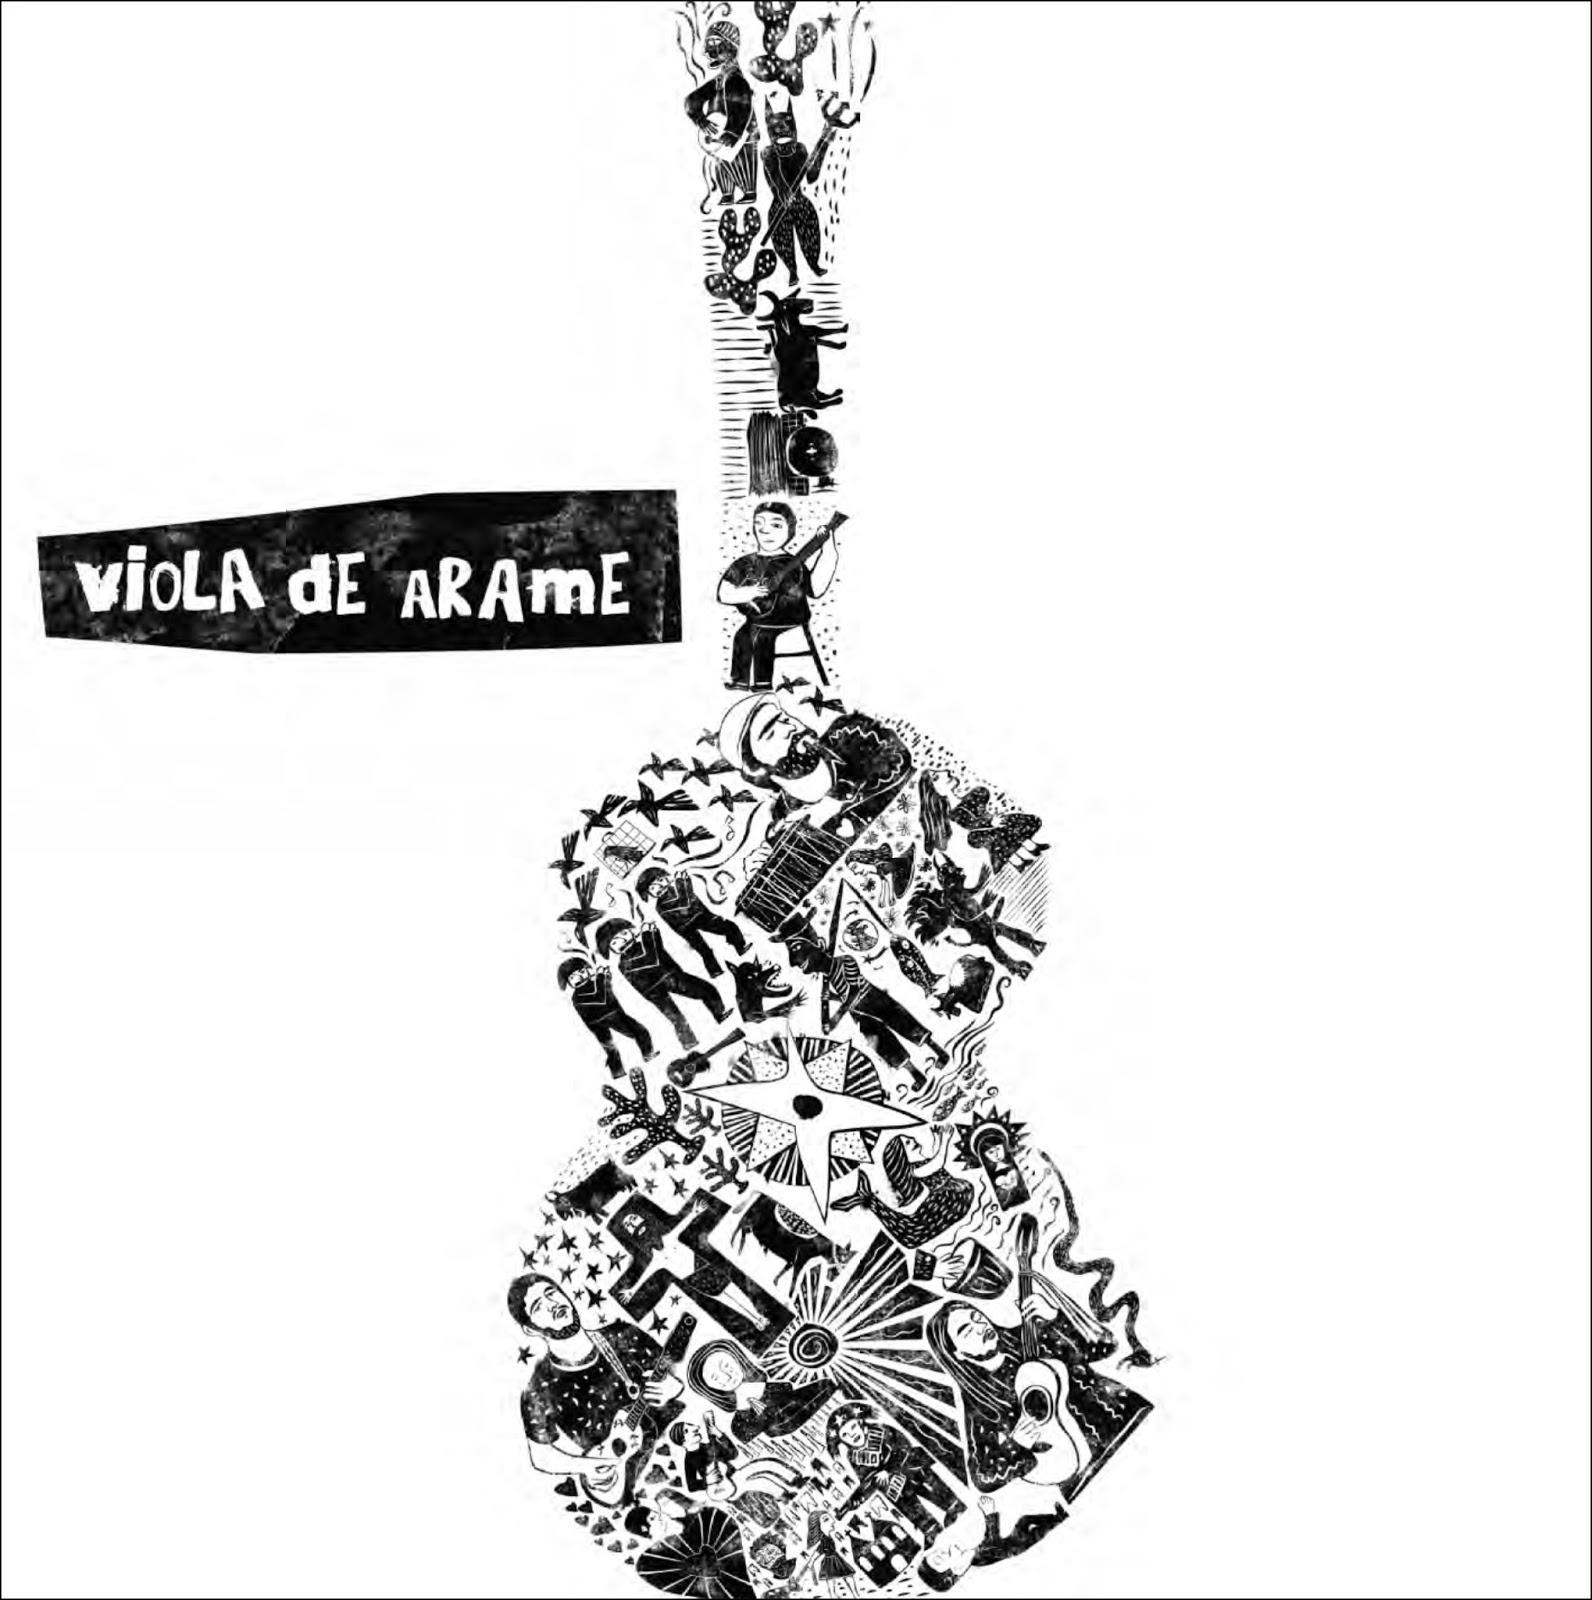 16 2011 Viola de Arame.jpg